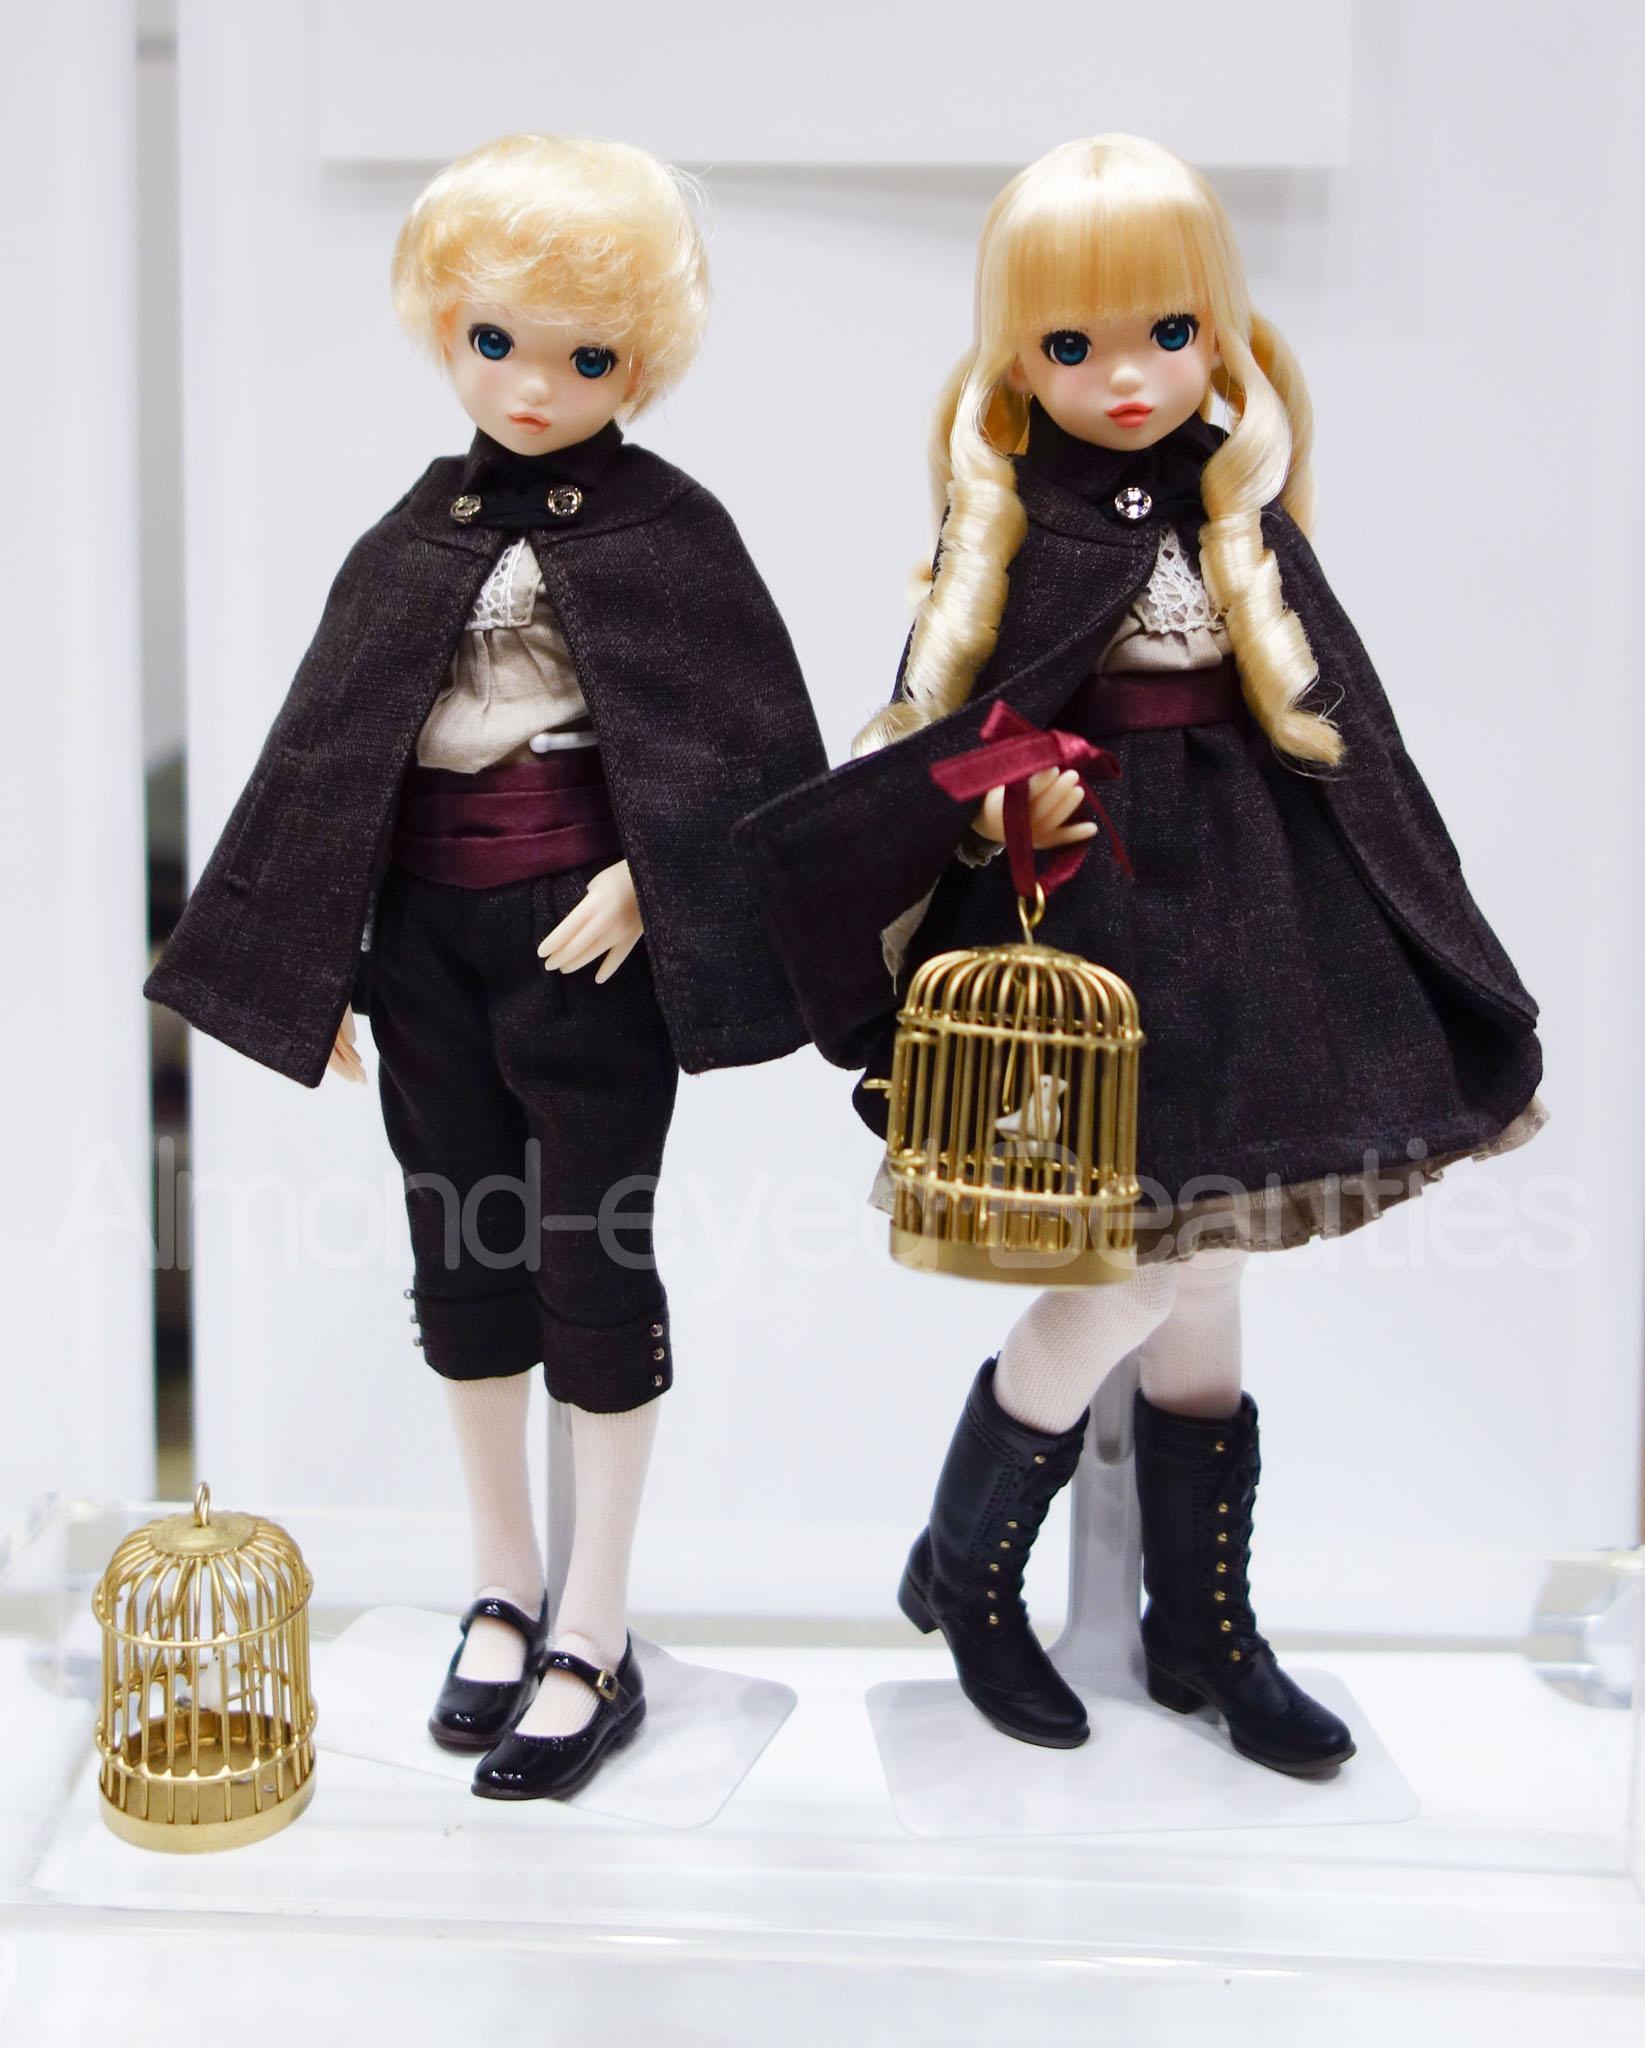 20161204 I Doll vol.48